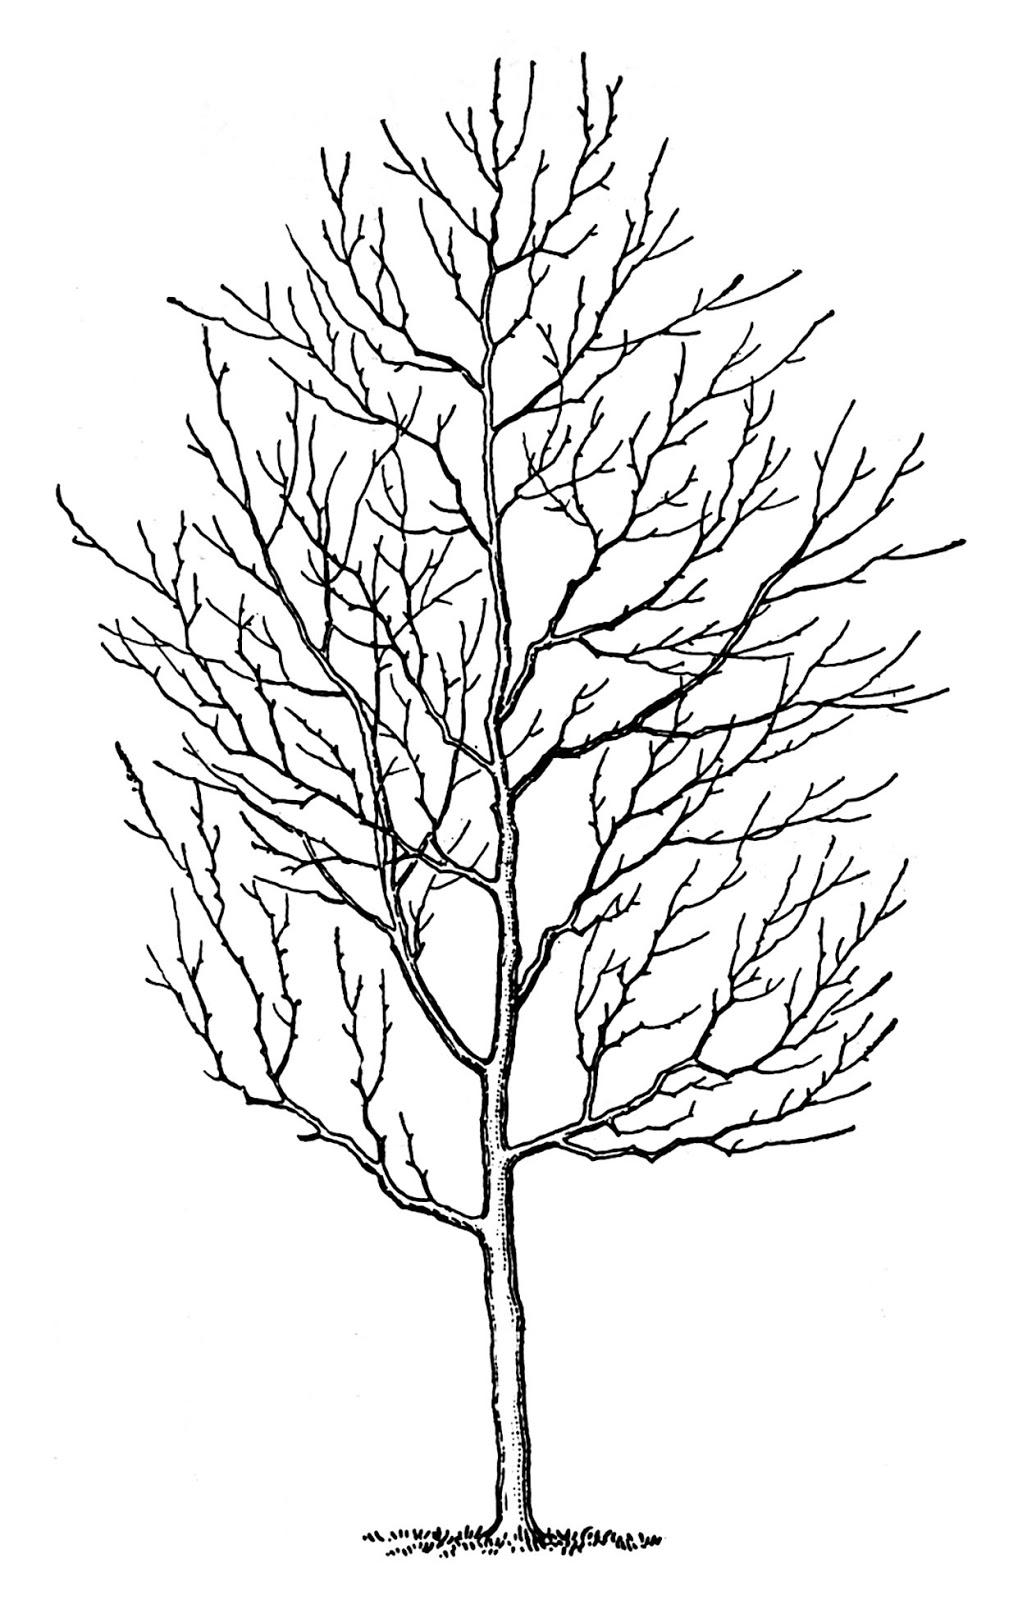 1018x1600 Spooky Tree Image Graphics Fairy21